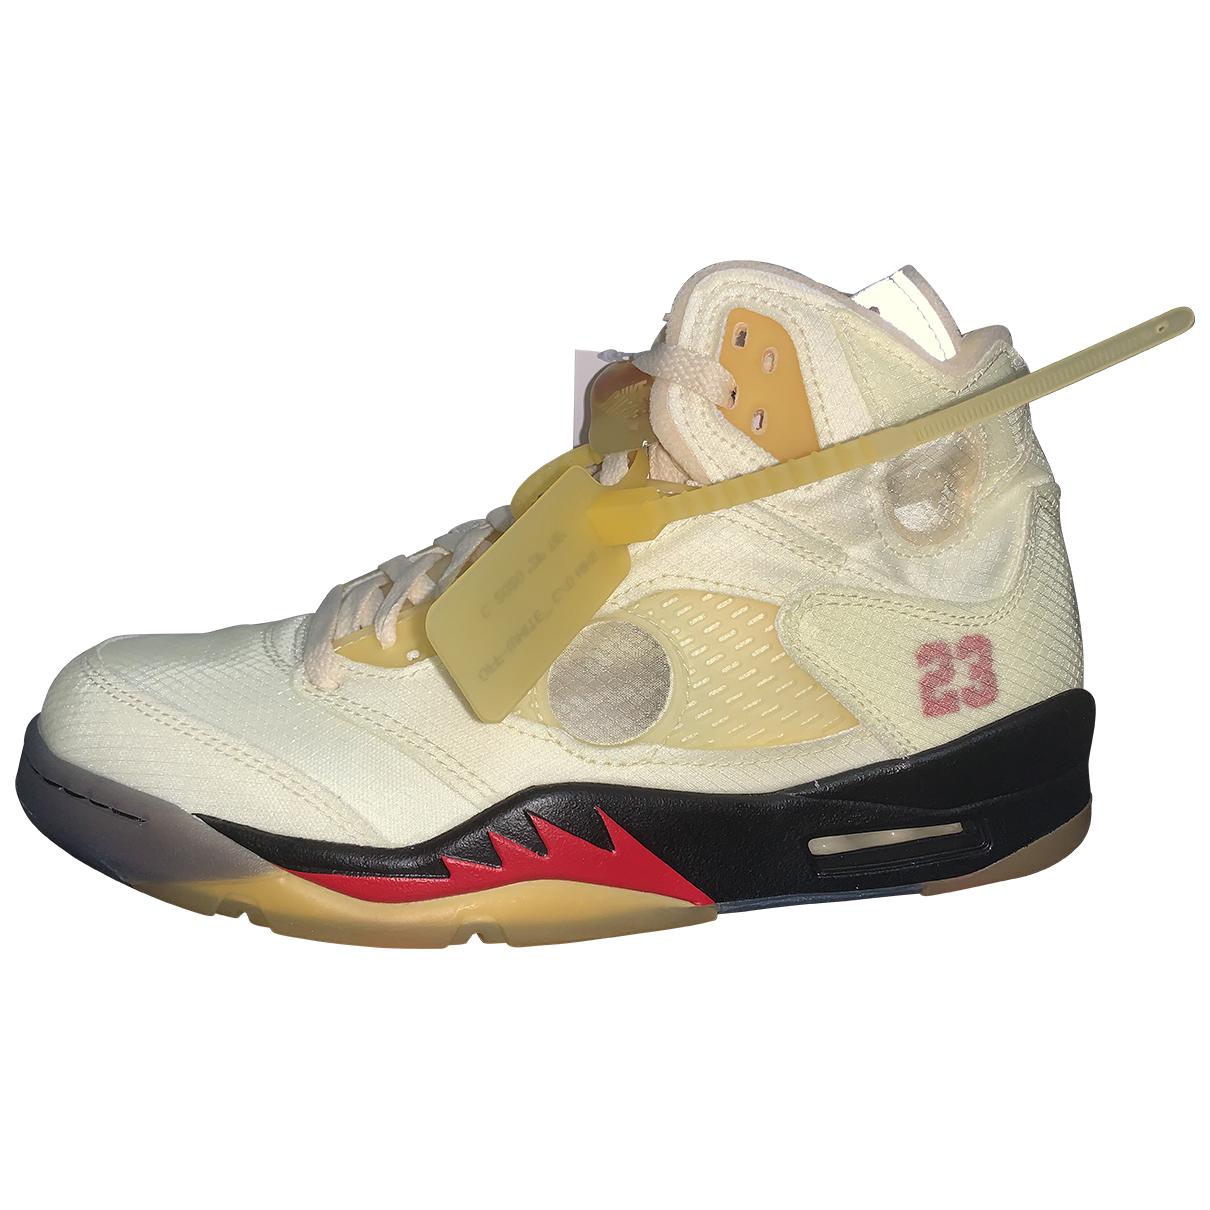 Deportivas Jordan 5 de Lona Nike X Off-white